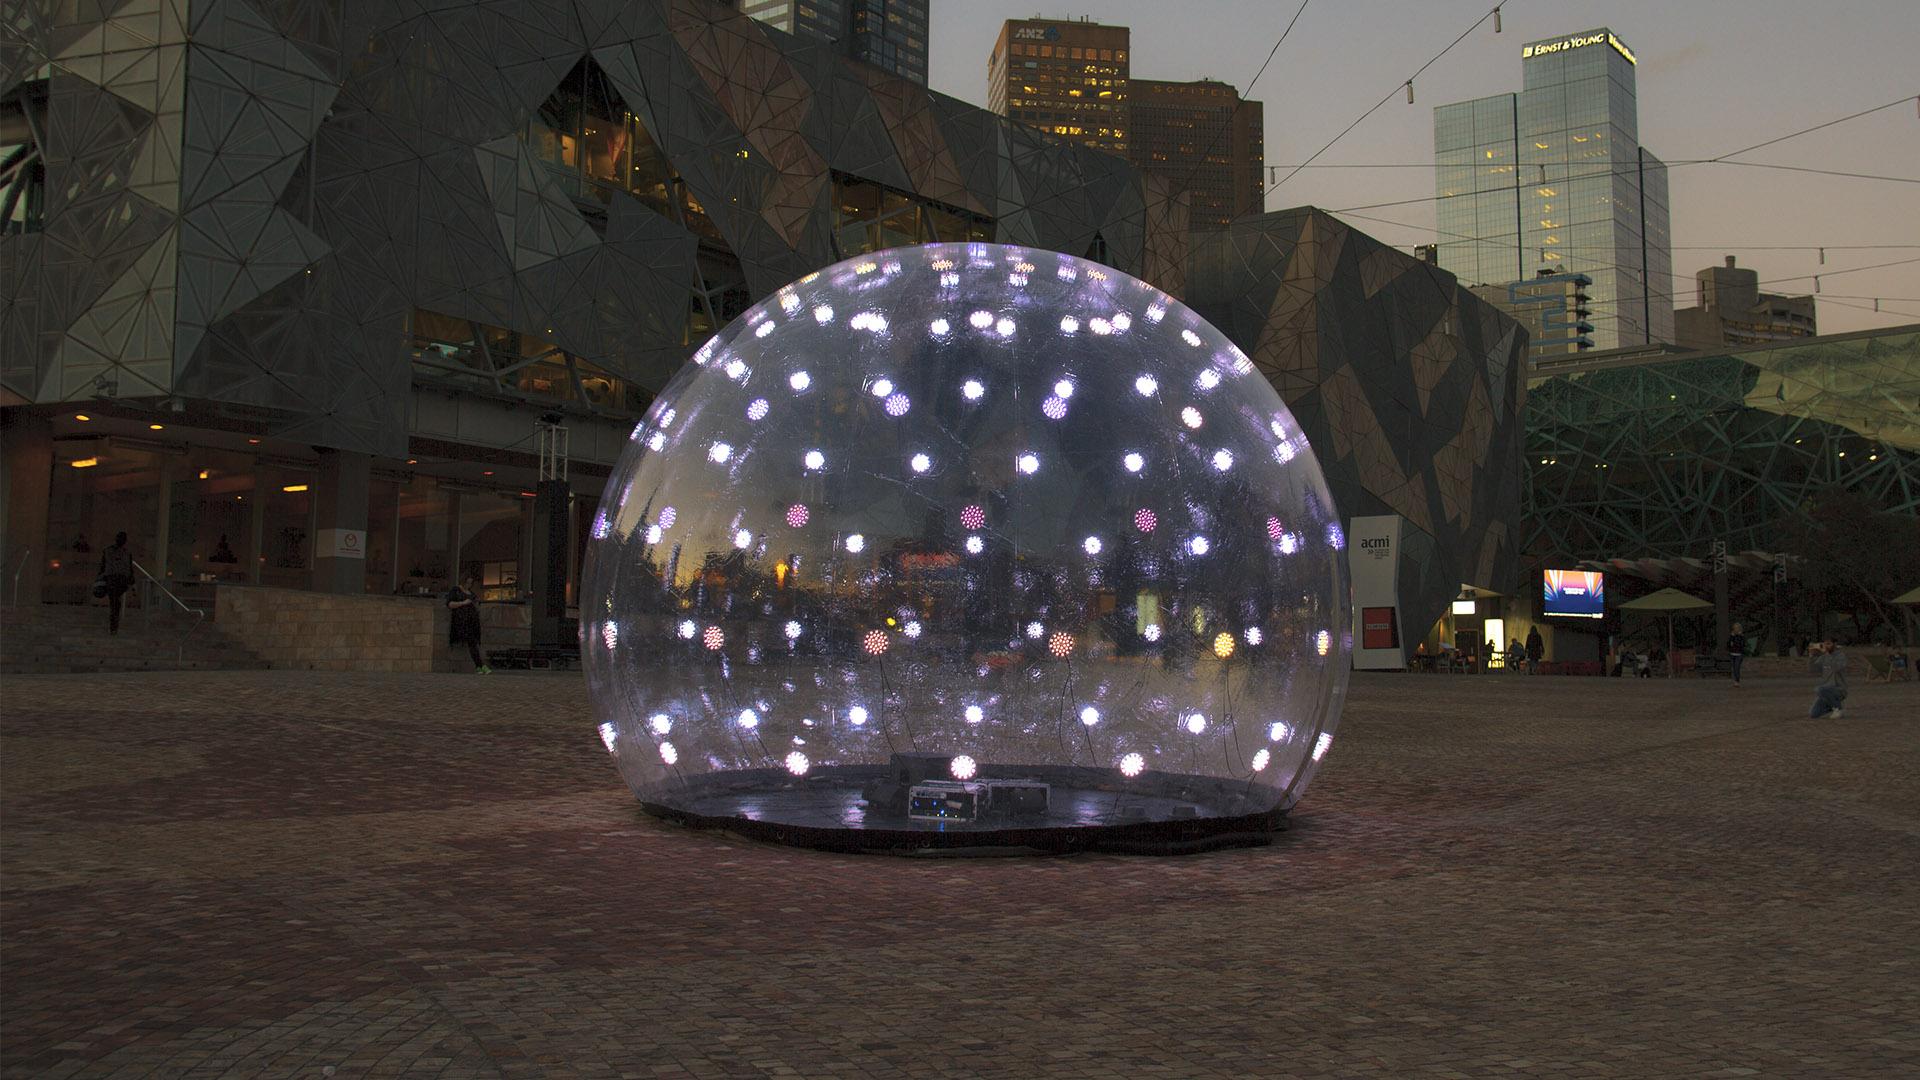 Sonic Light Bubble - Federation Square